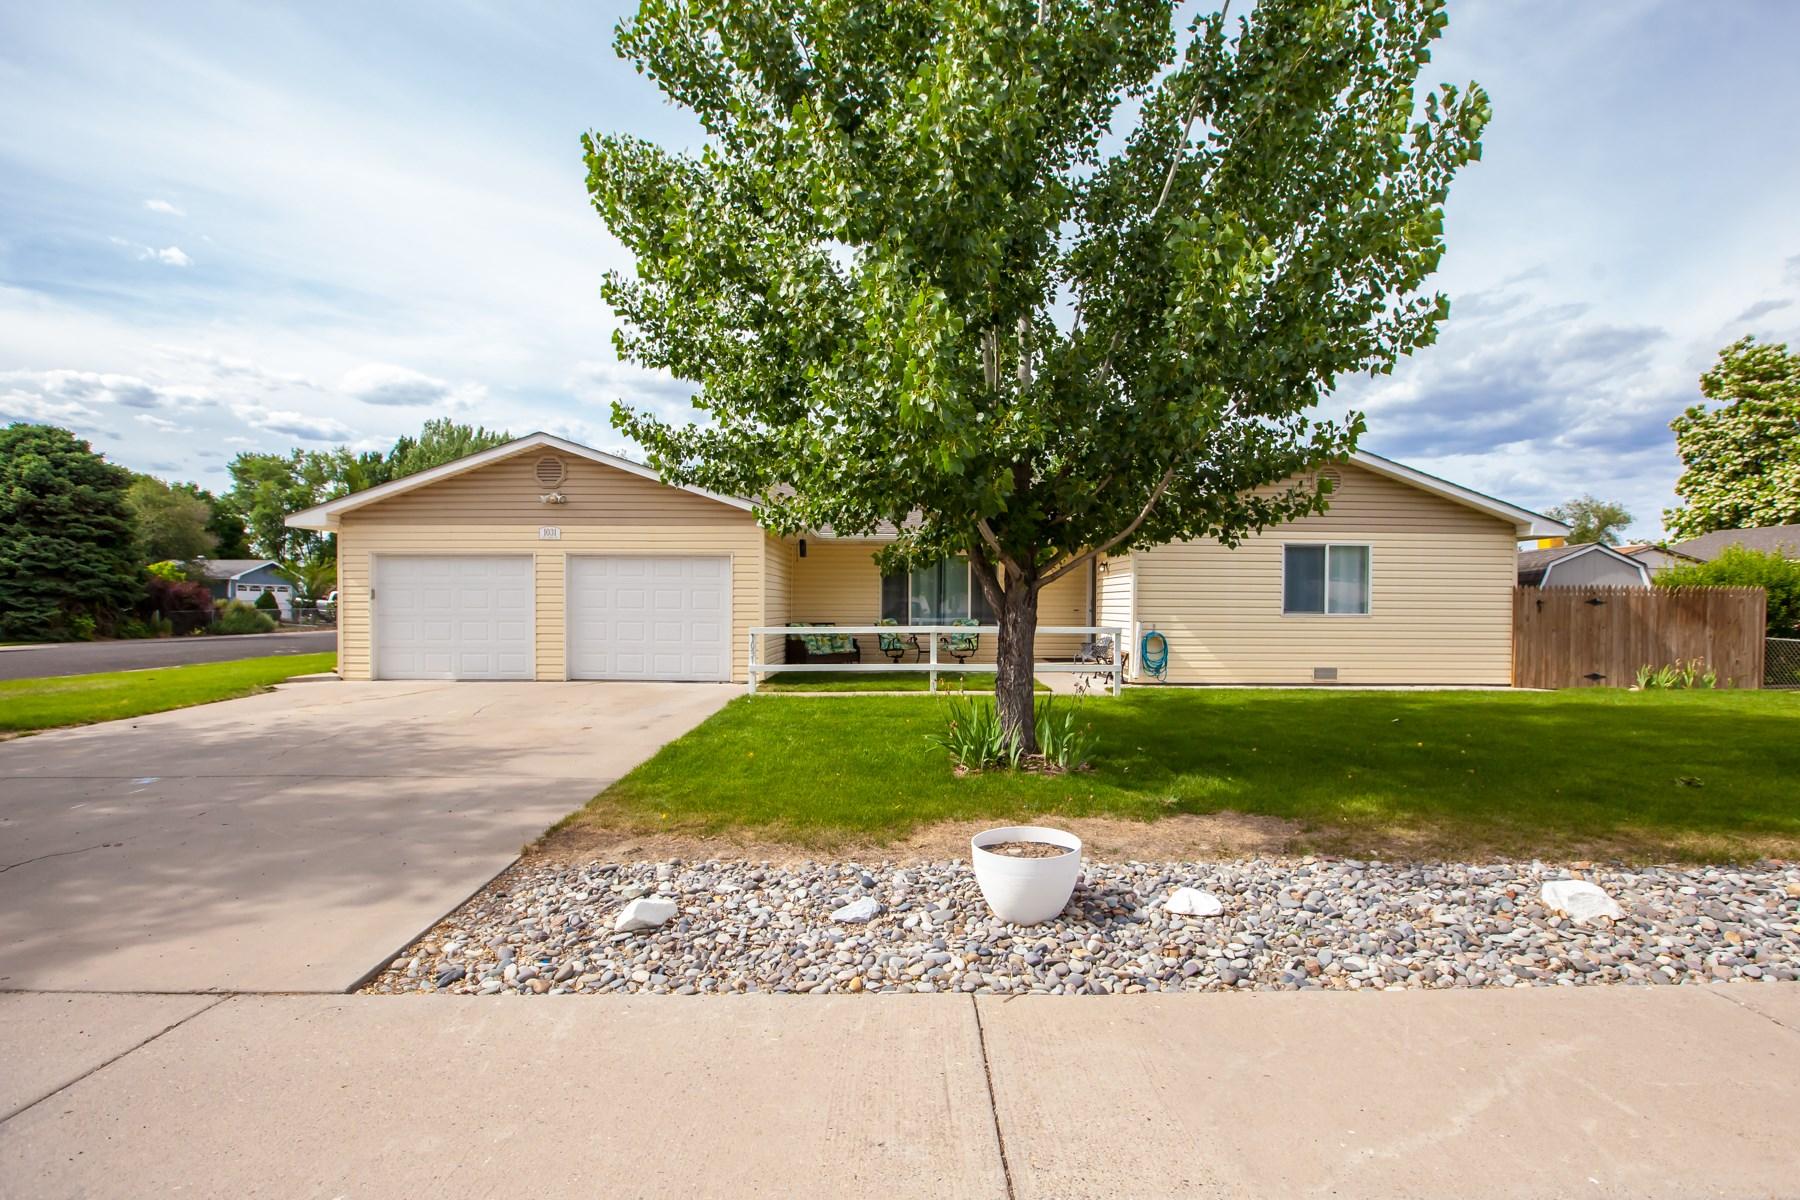 House For Sale In Fruita Colorado Hiking and Biking